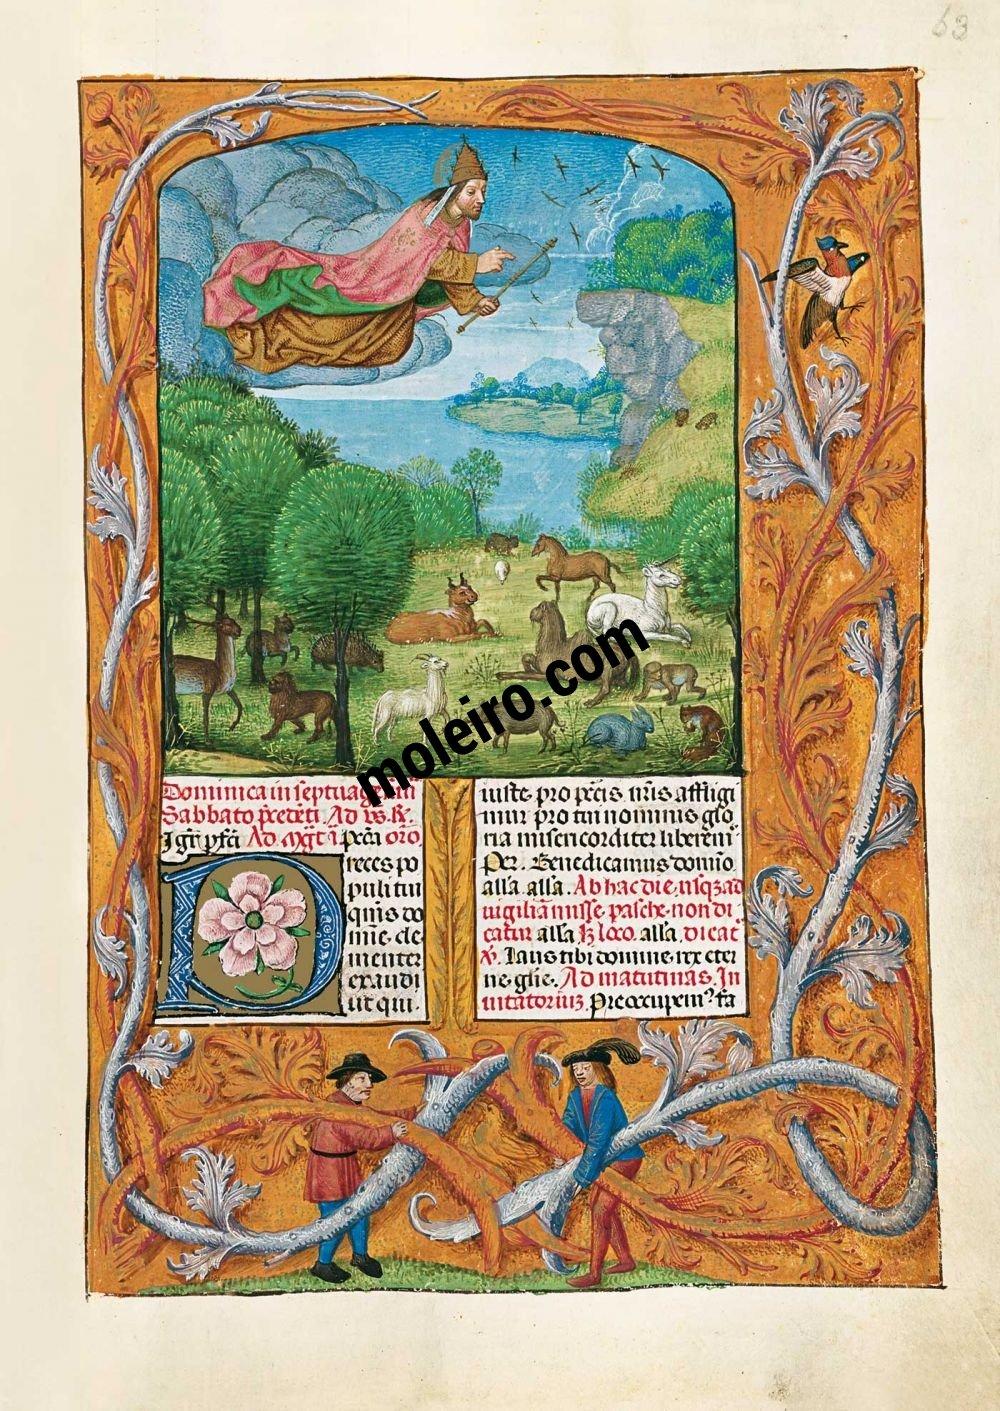 The Isabella Breviary f. 63r, Creation